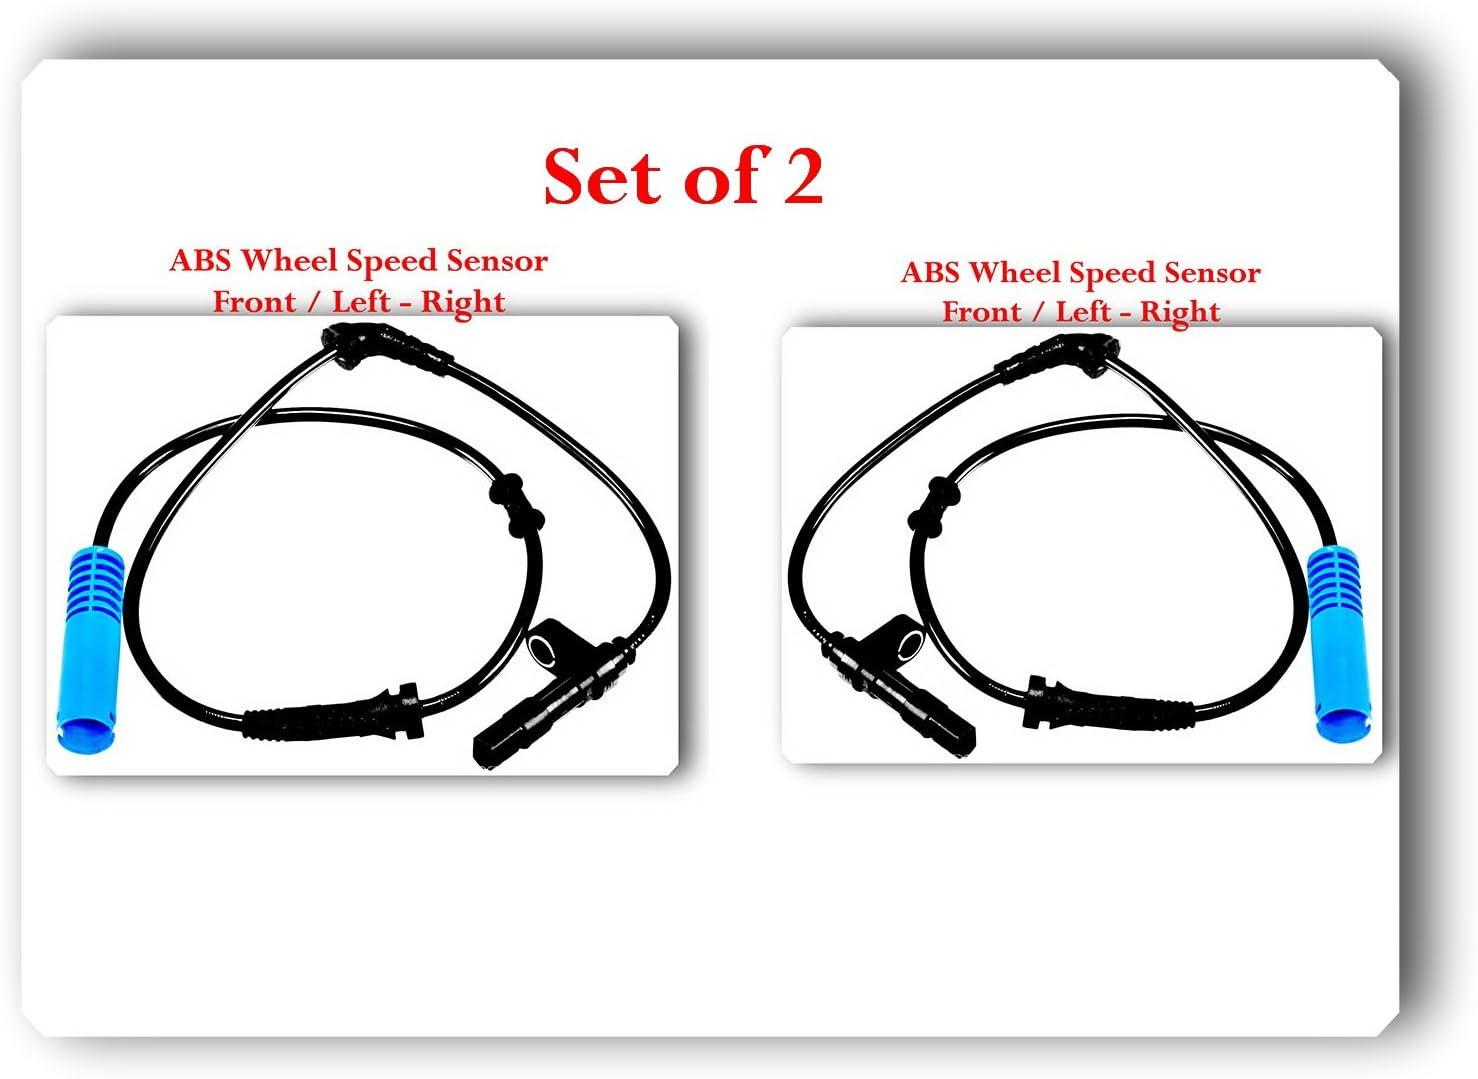 Right Mini Cooper 2002 2008 Left Fits Set 2 ABS Wheel Speed Sensor Front